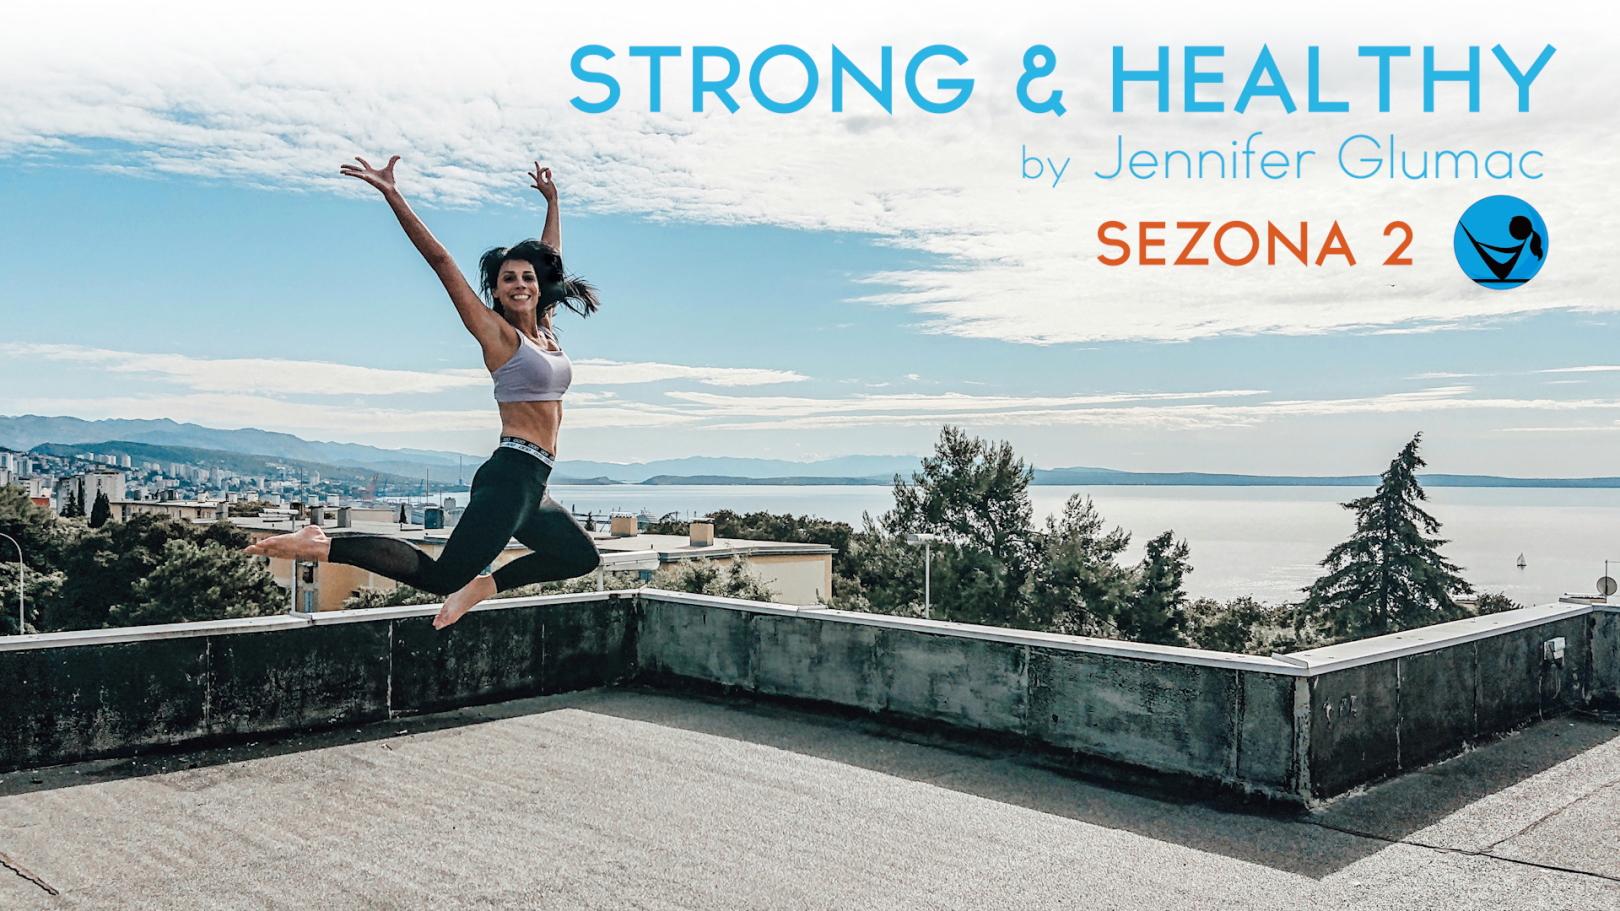 Nova sezona STRONG & HEALTHY s Jennifer Glumac